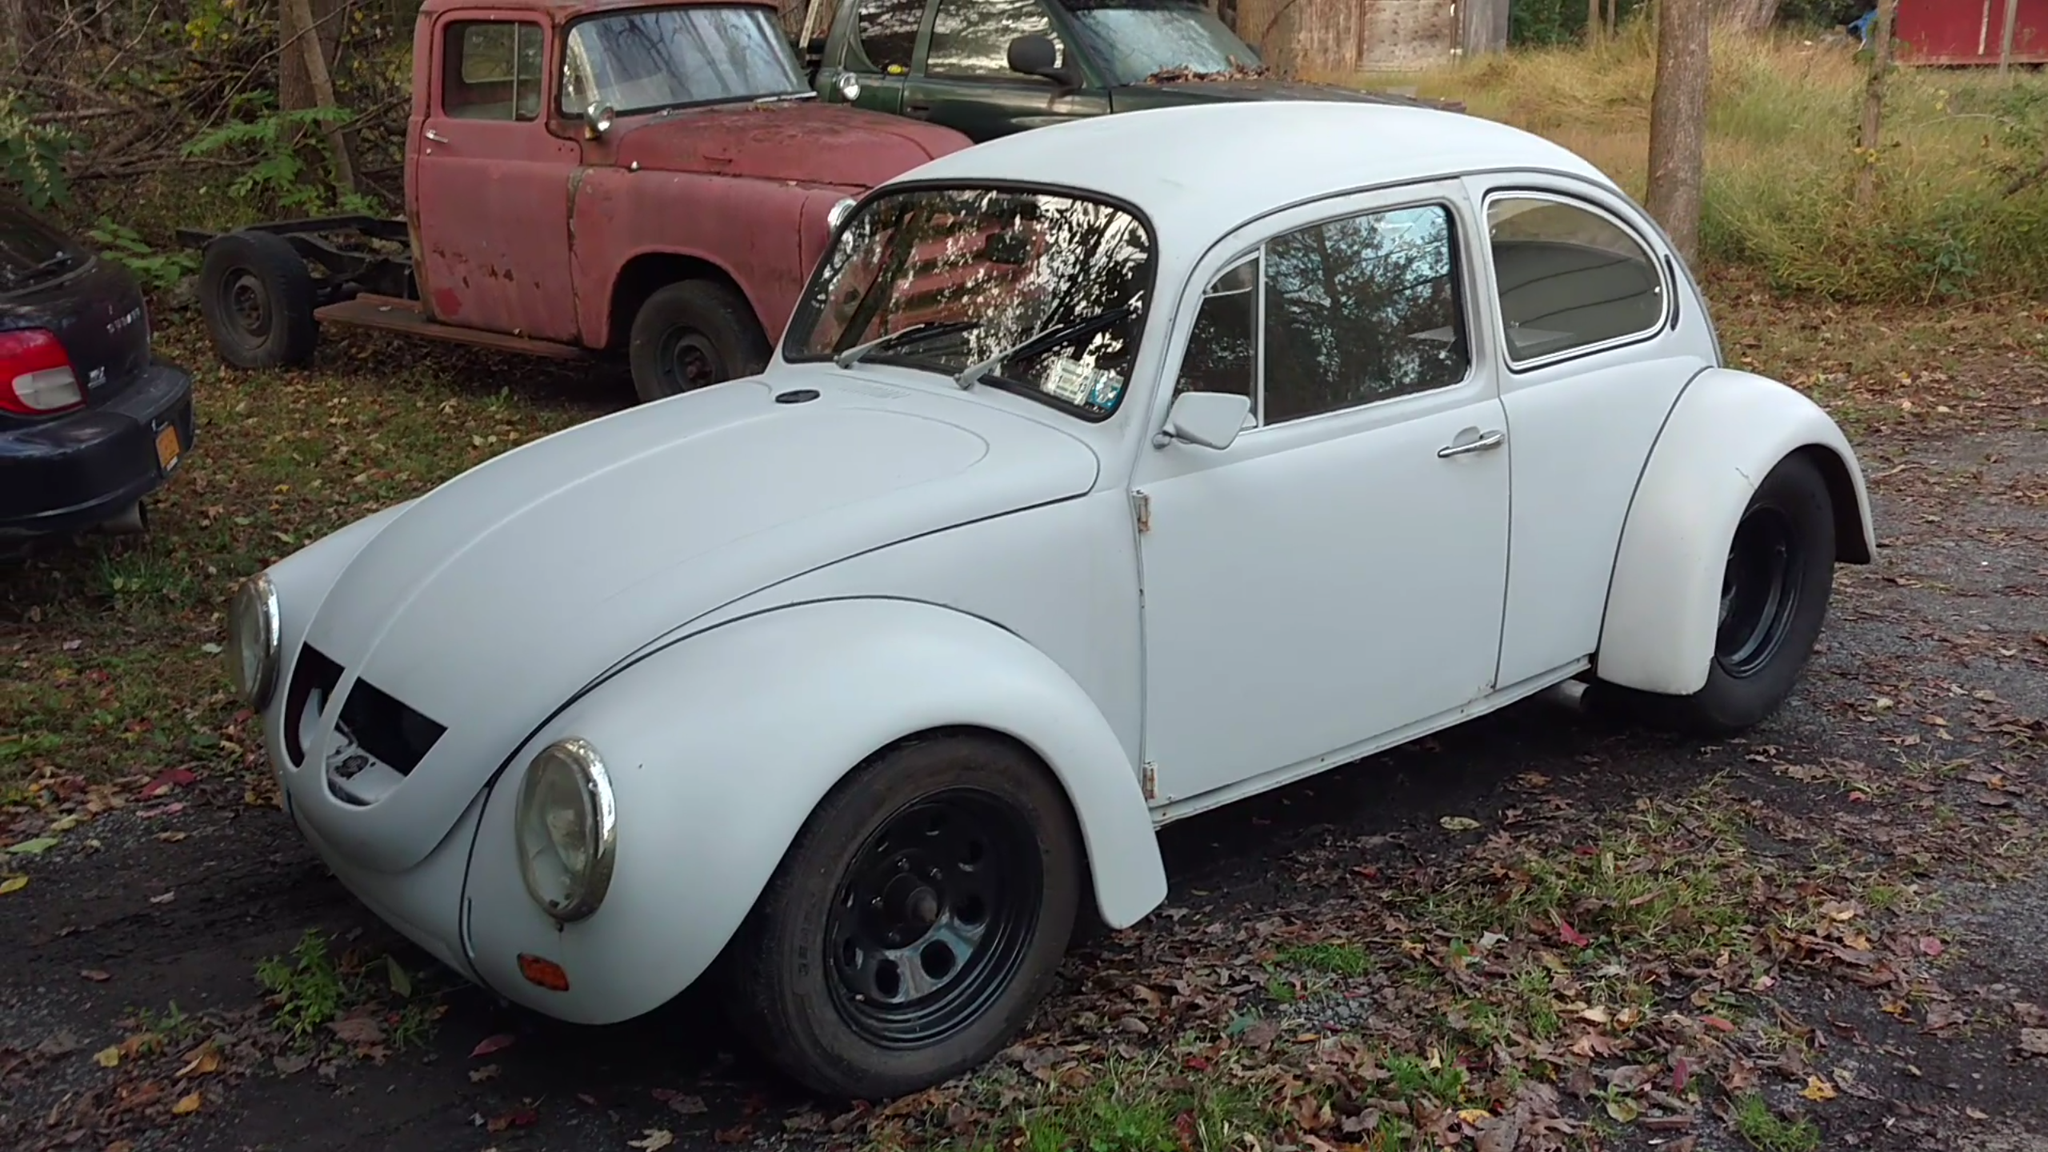 Michael Lustrino, 1971 Volkswagen Super Beetle - Pine Bush, NY